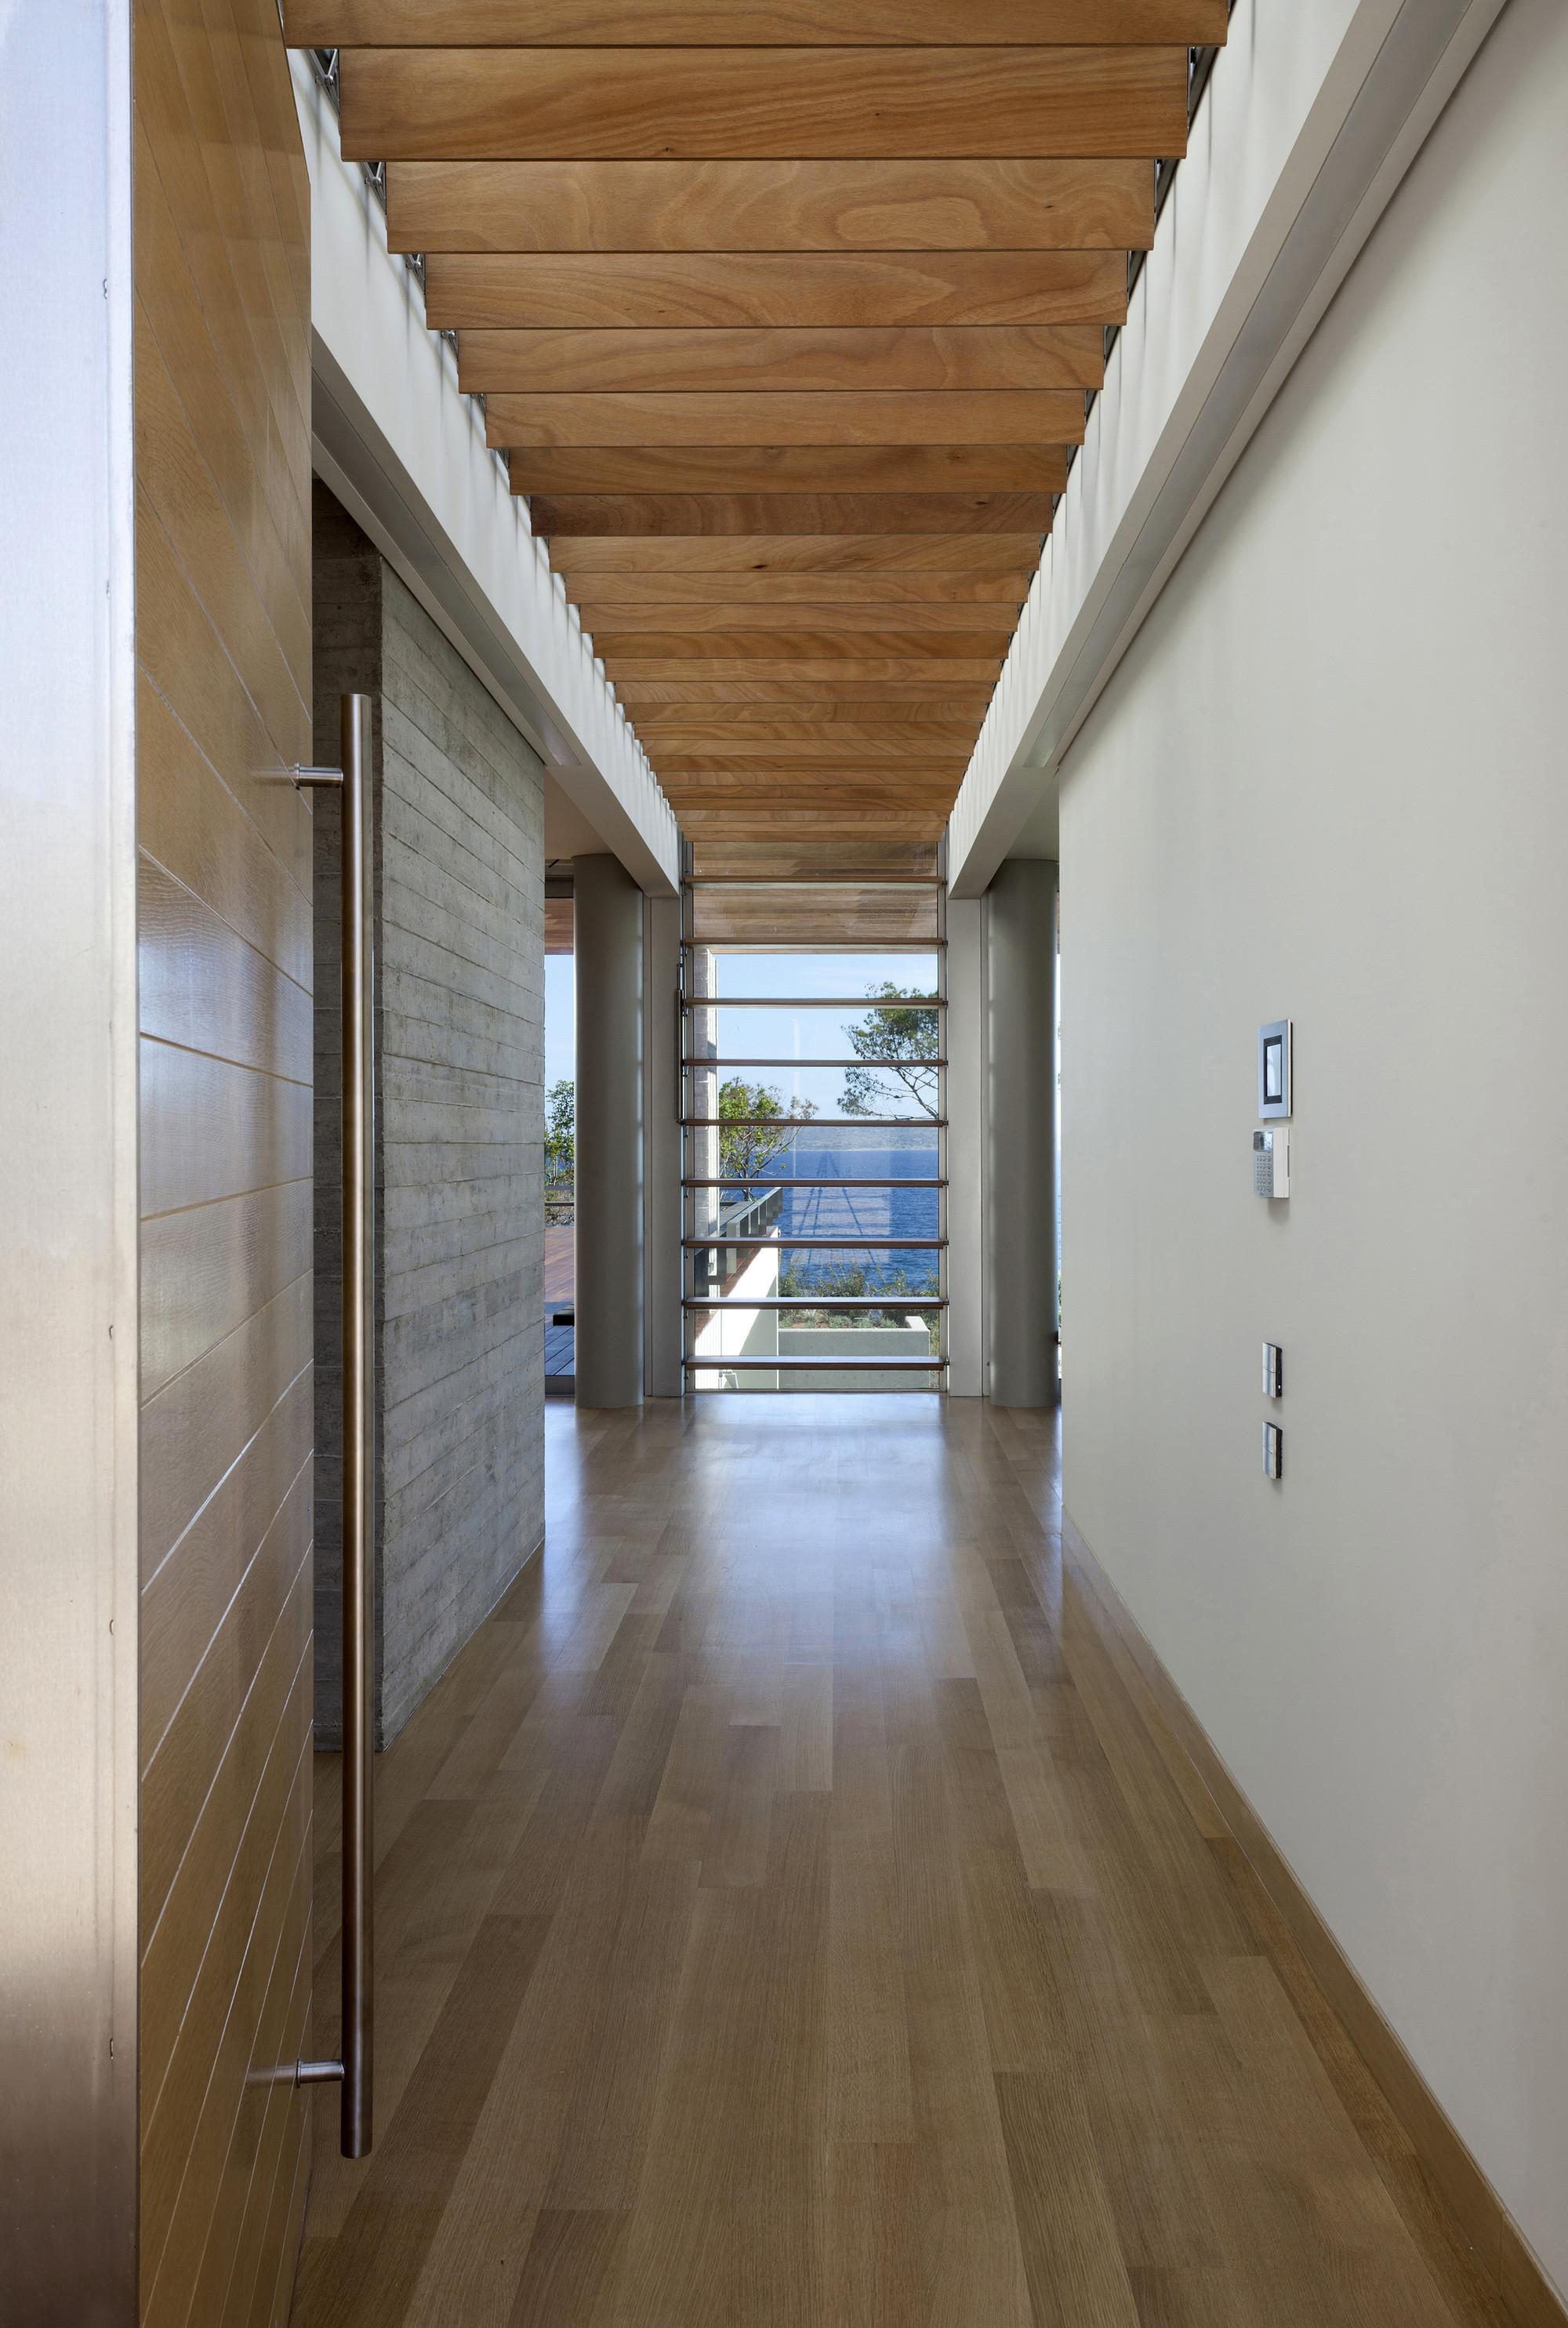 House B_Interior view